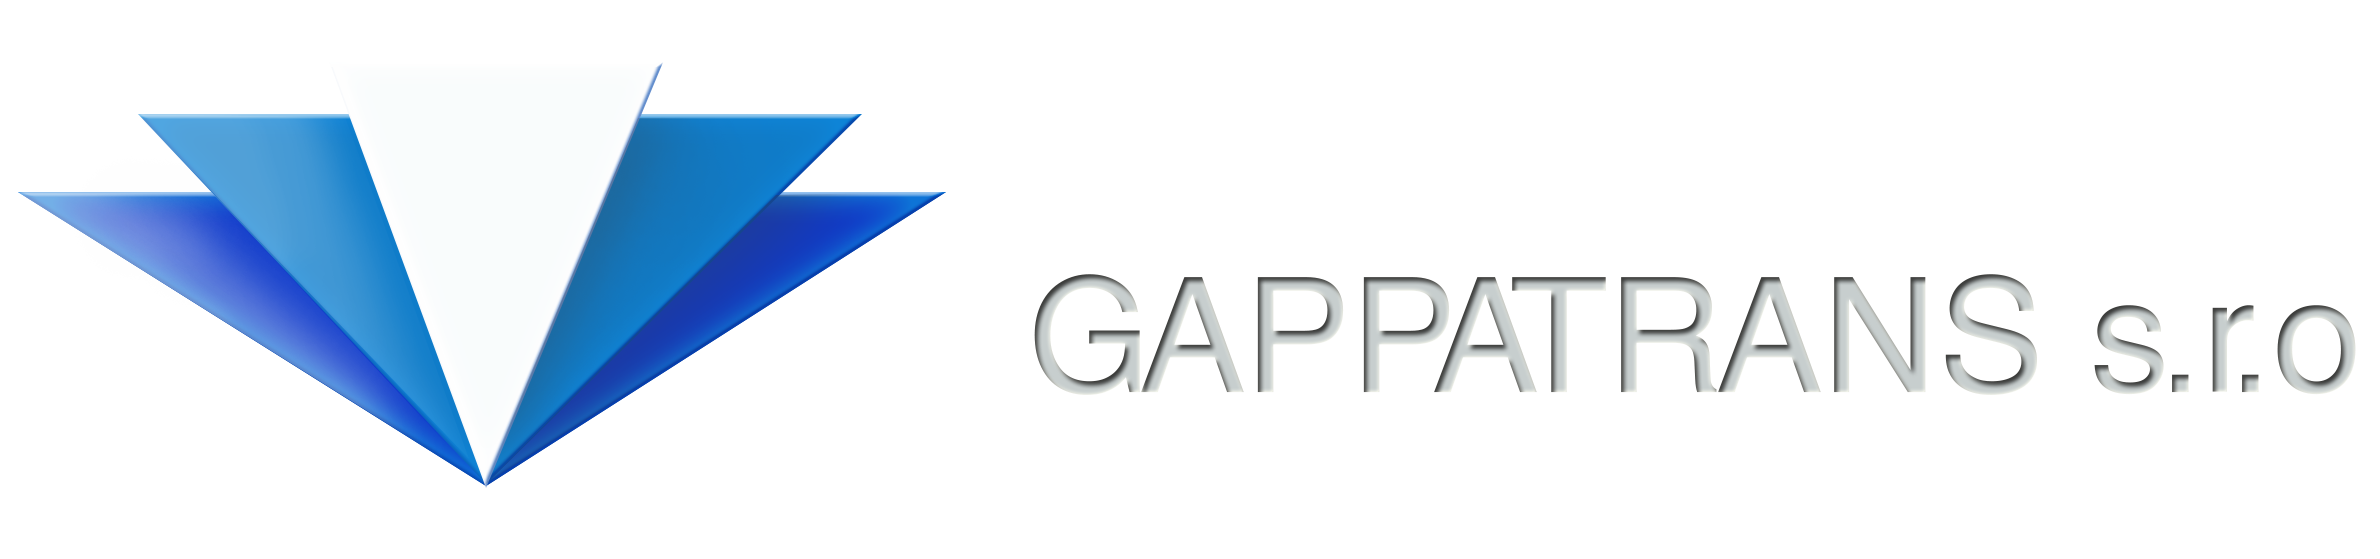 GAPPATRANS s.r.o.